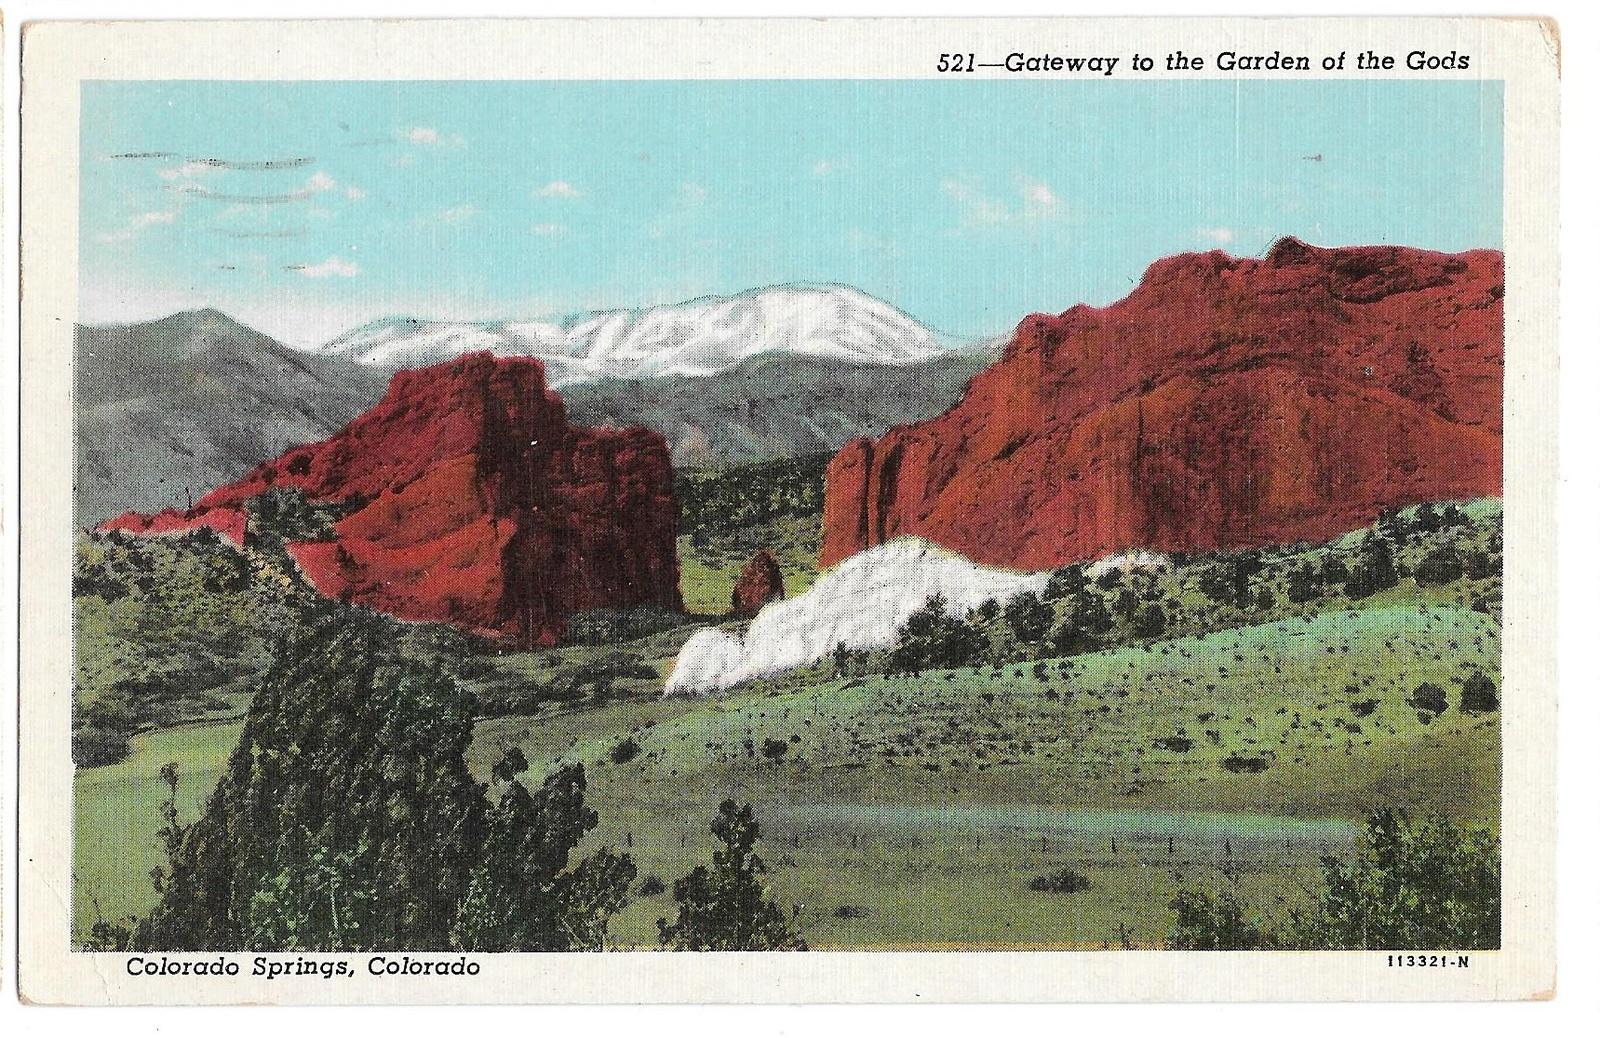 99 br 1925 1bx co colorado springs gateway to garden of the gods